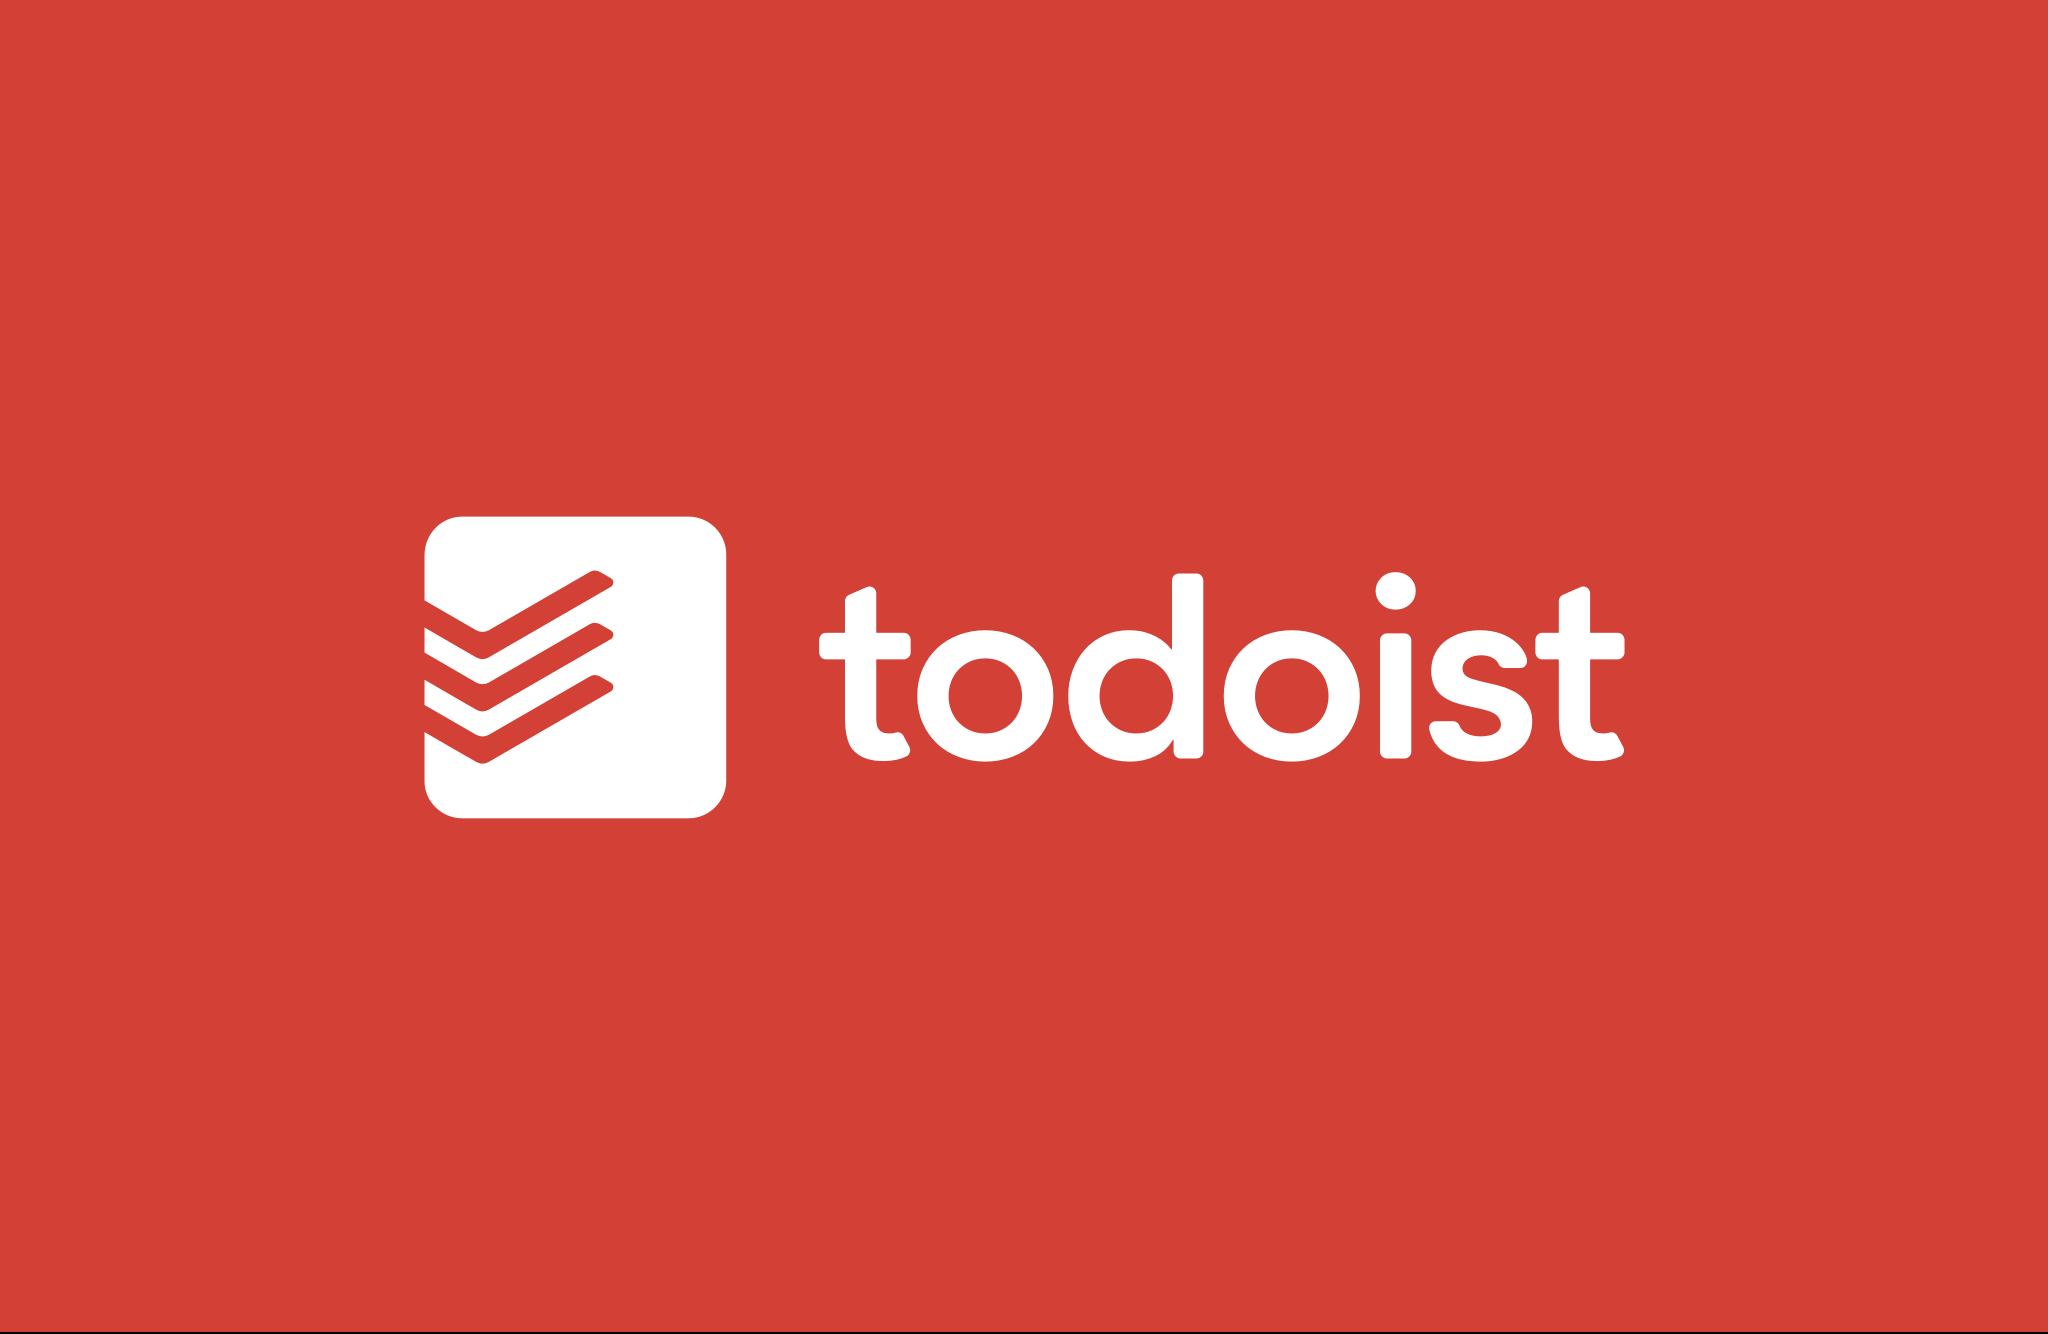 Todoist new logo red